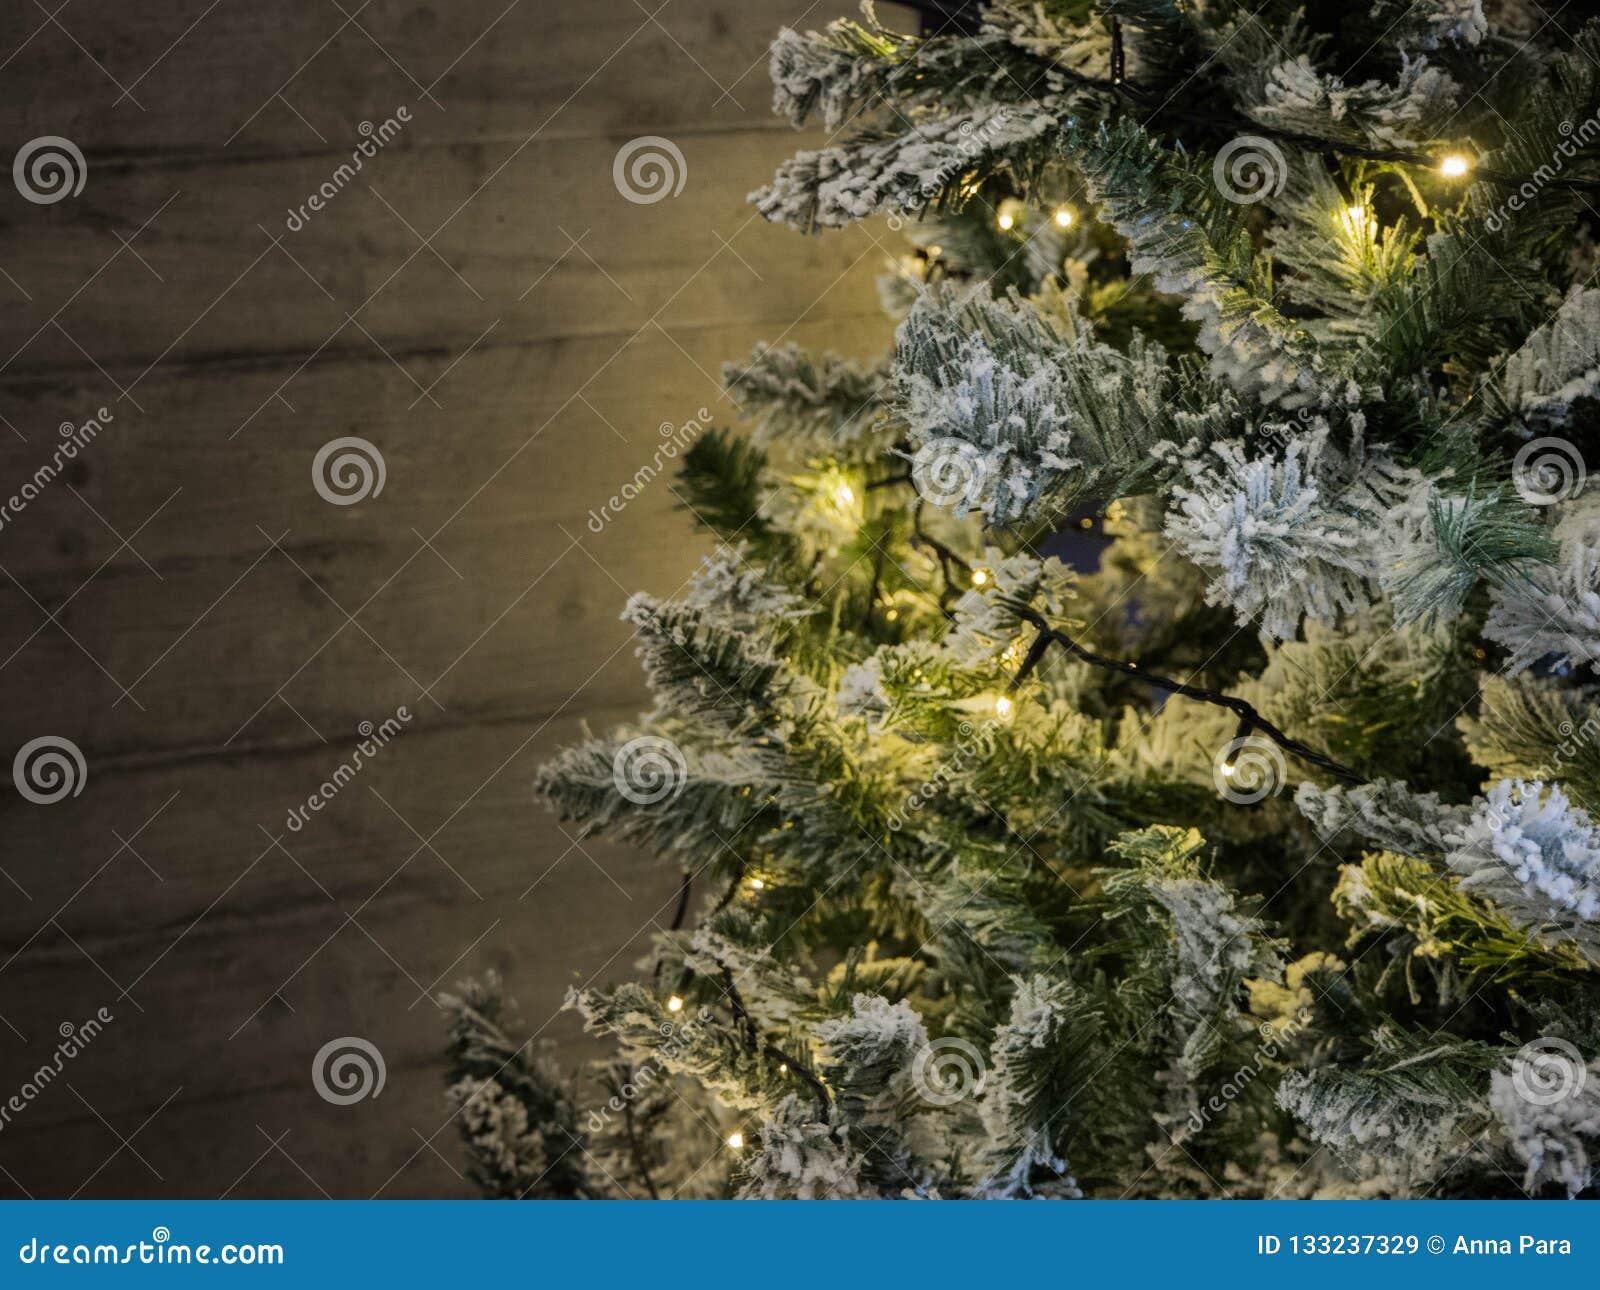 Christmas Tree With Warm Lights Holiday Time Stock Image Image Of